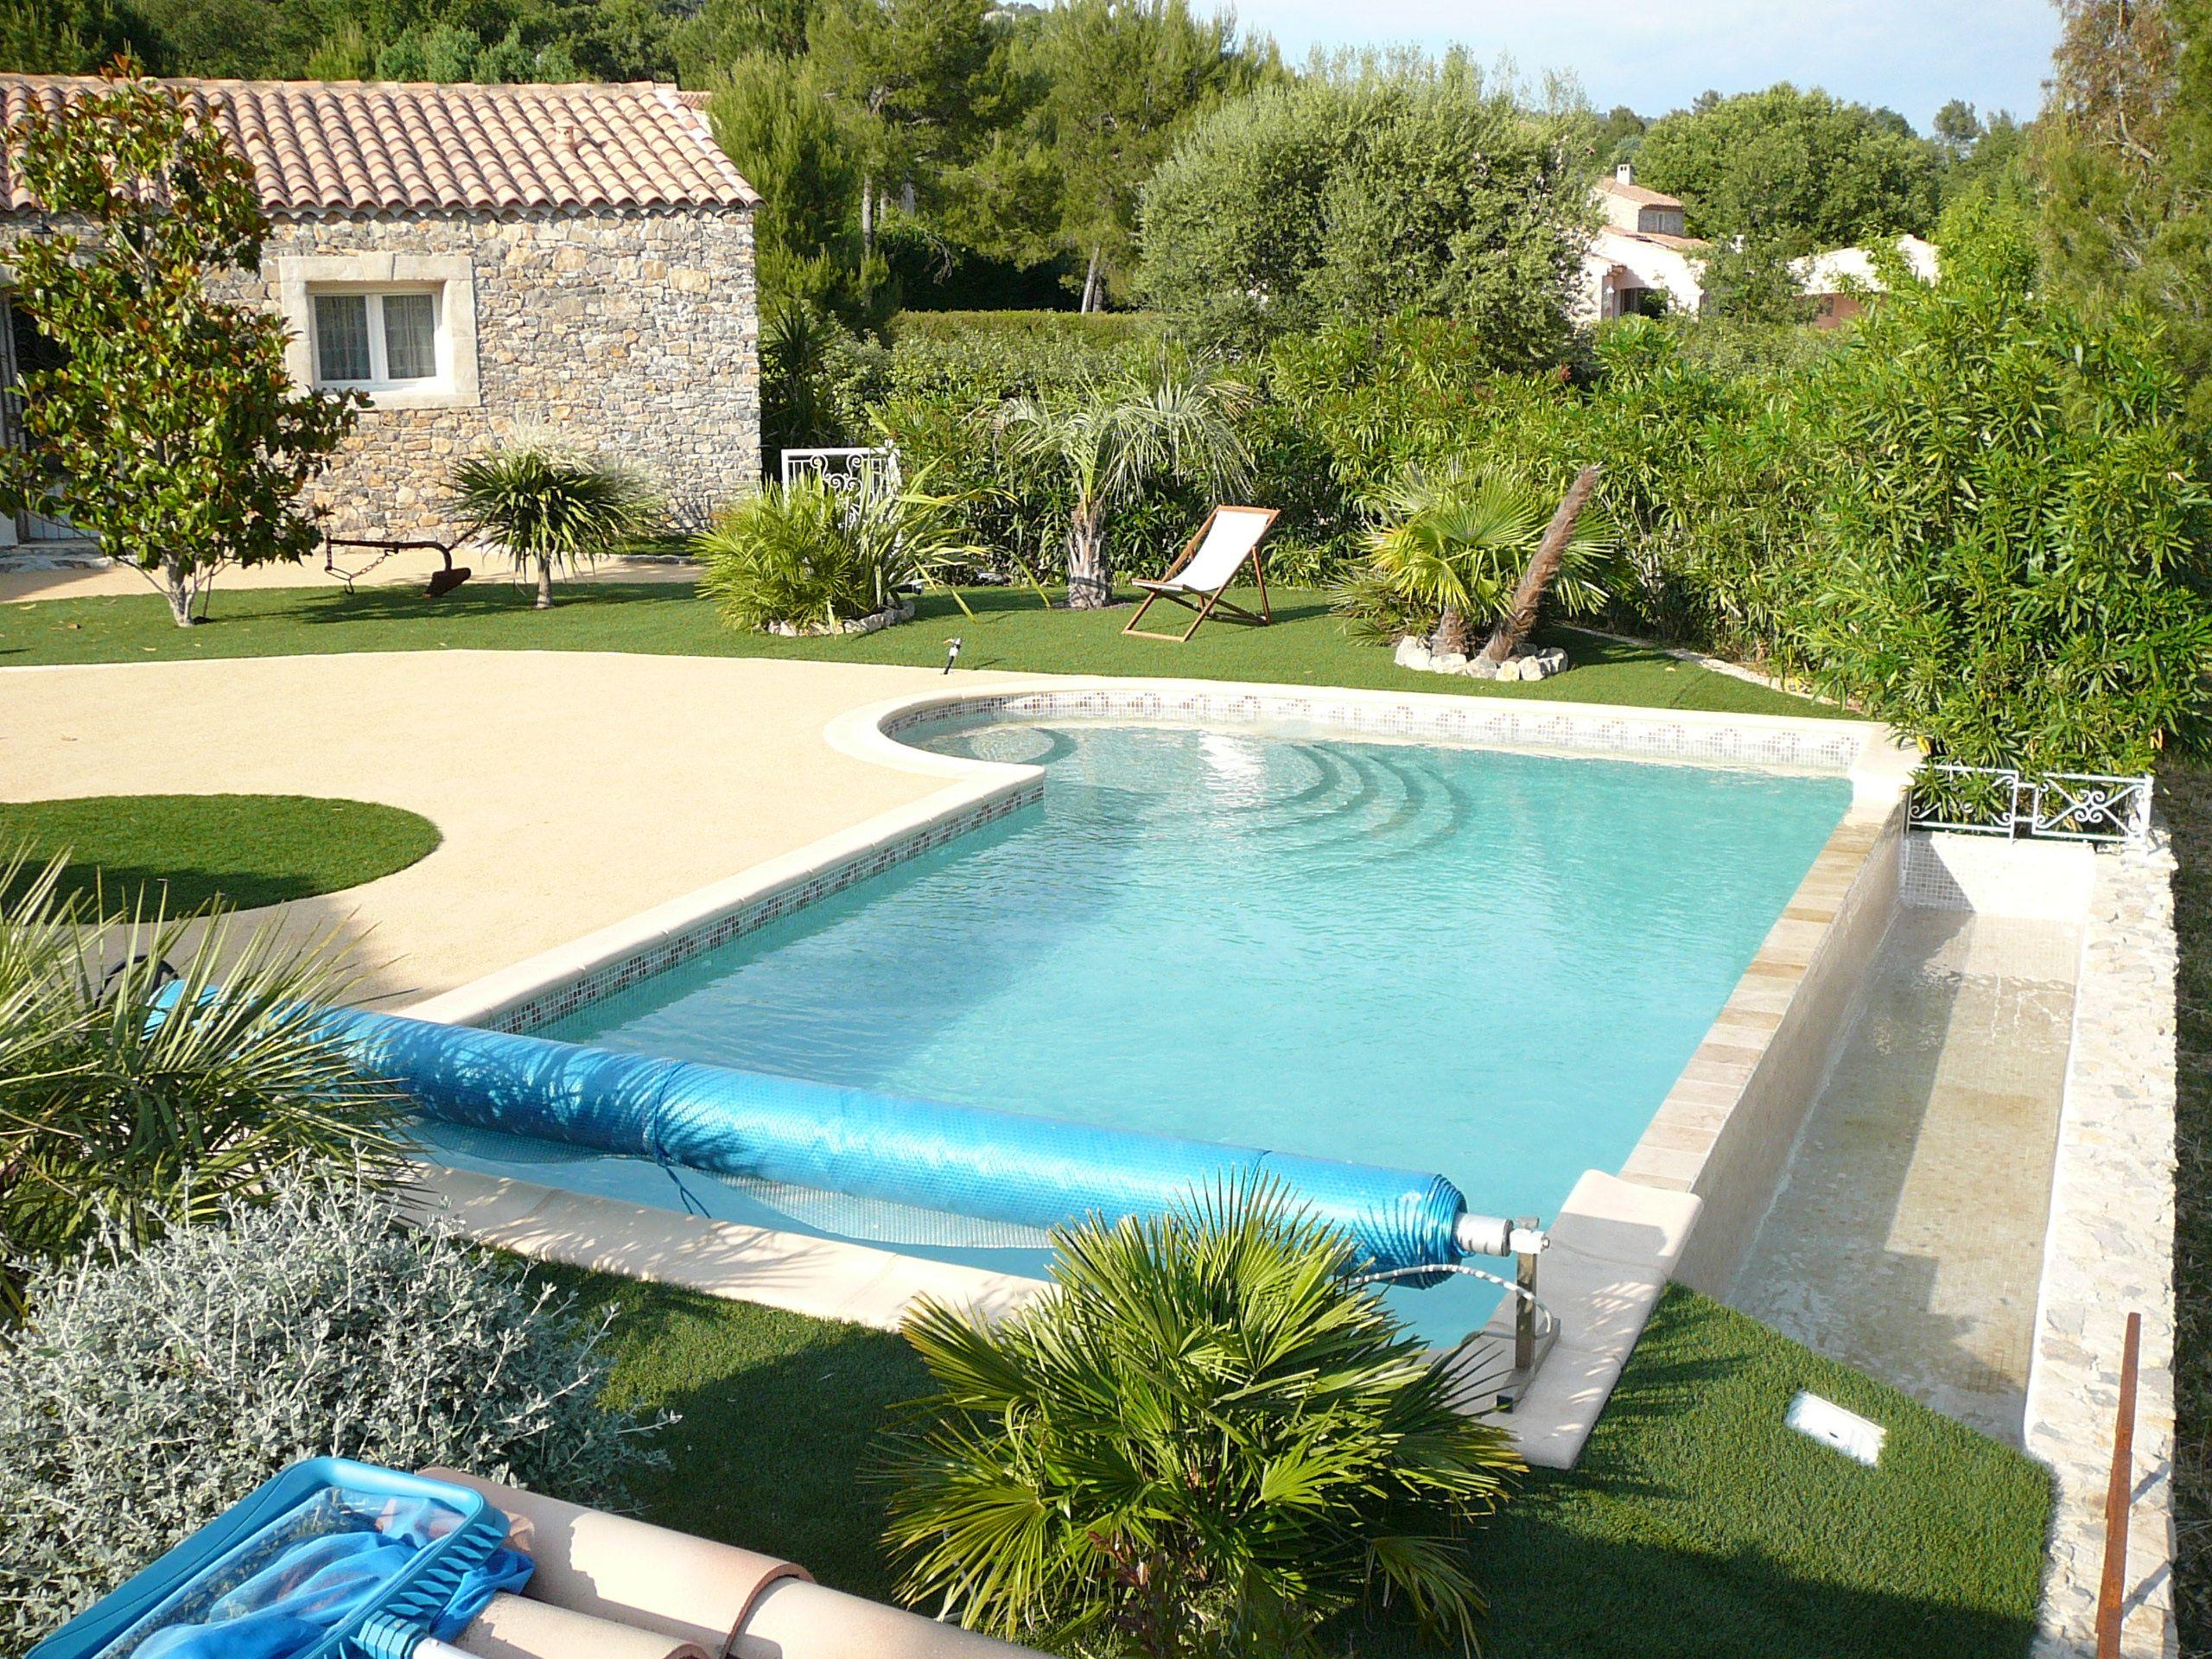 piscine a debordement 9 x 4 pinterest le sel piscines et construction. Black Bedroom Furniture Sets. Home Design Ideas